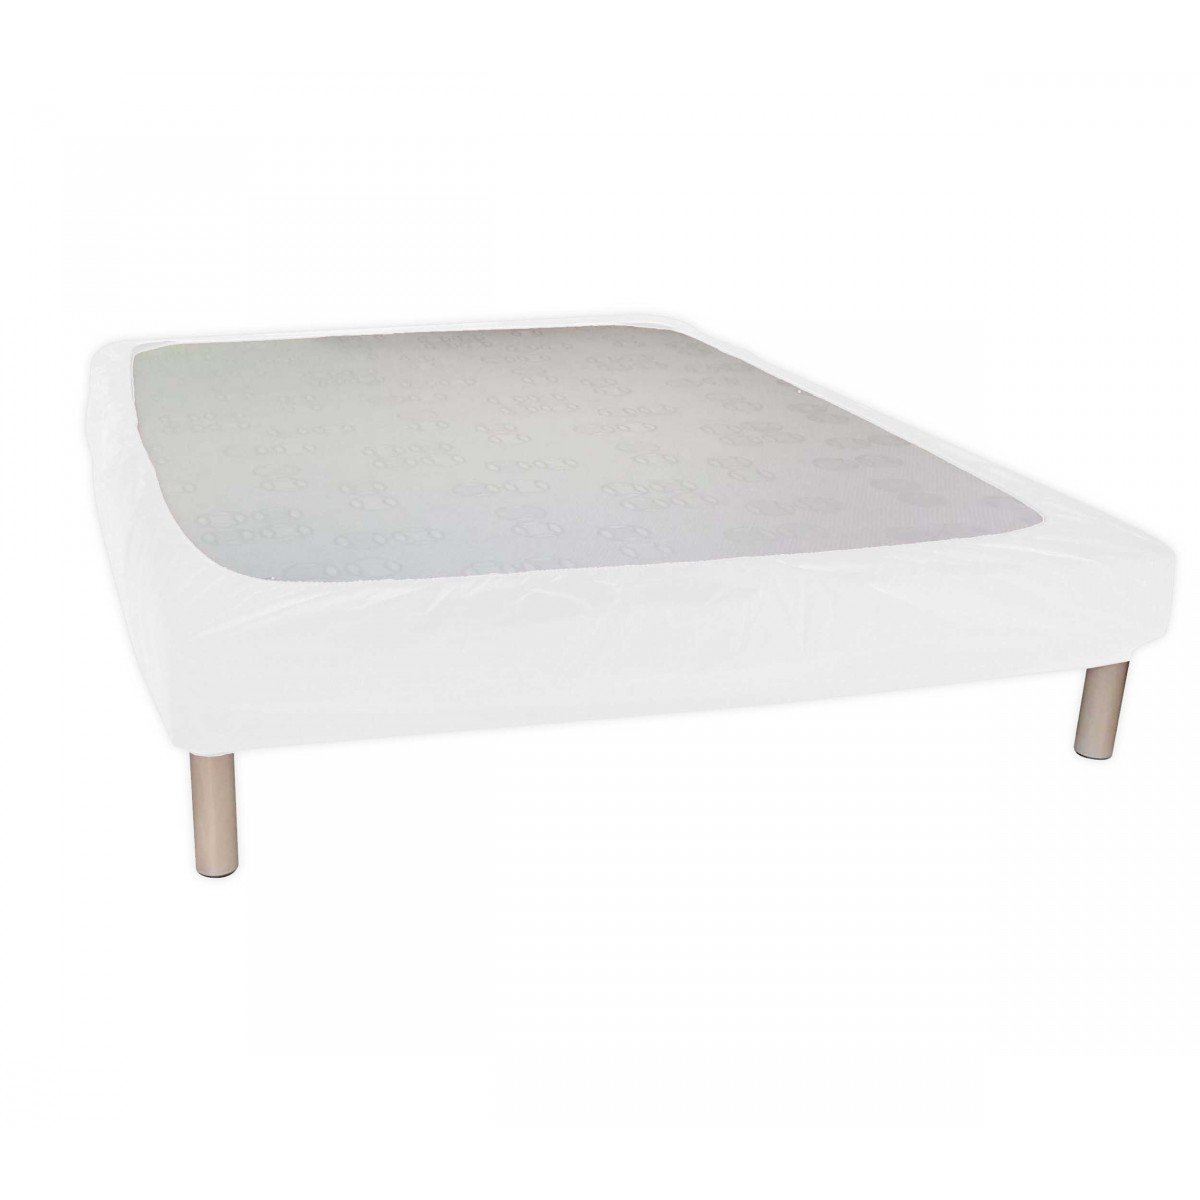 sommier 140x190 tapissier cadre with sommier 140x190. Black Bedroom Furniture Sets. Home Design Ideas